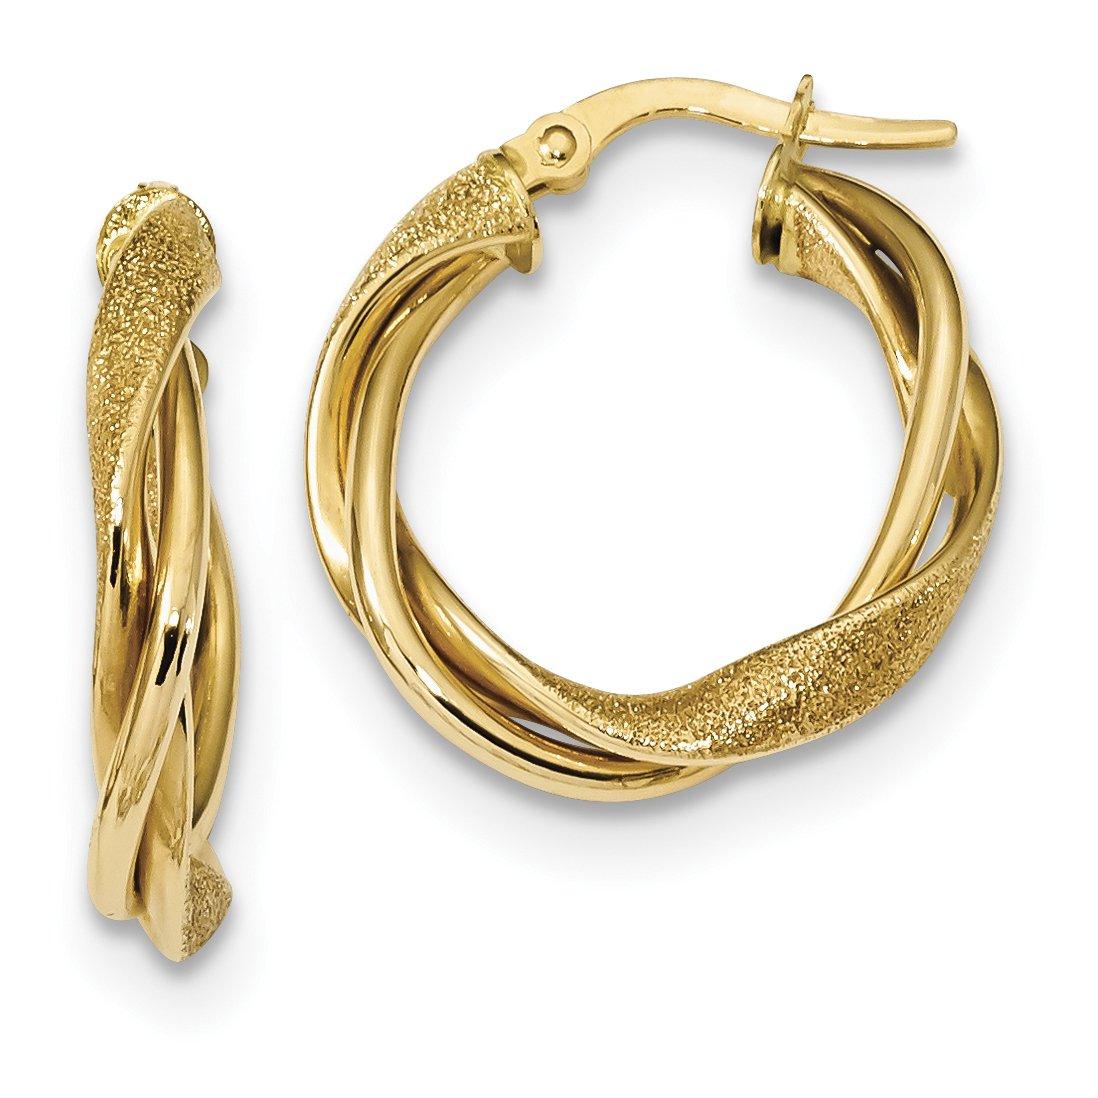 ICE CARATS 14k Yellow Gold Textured Twisted Hoop Earrings Ear Hoops Set Fine Jewelry Gift Set For Women Heart